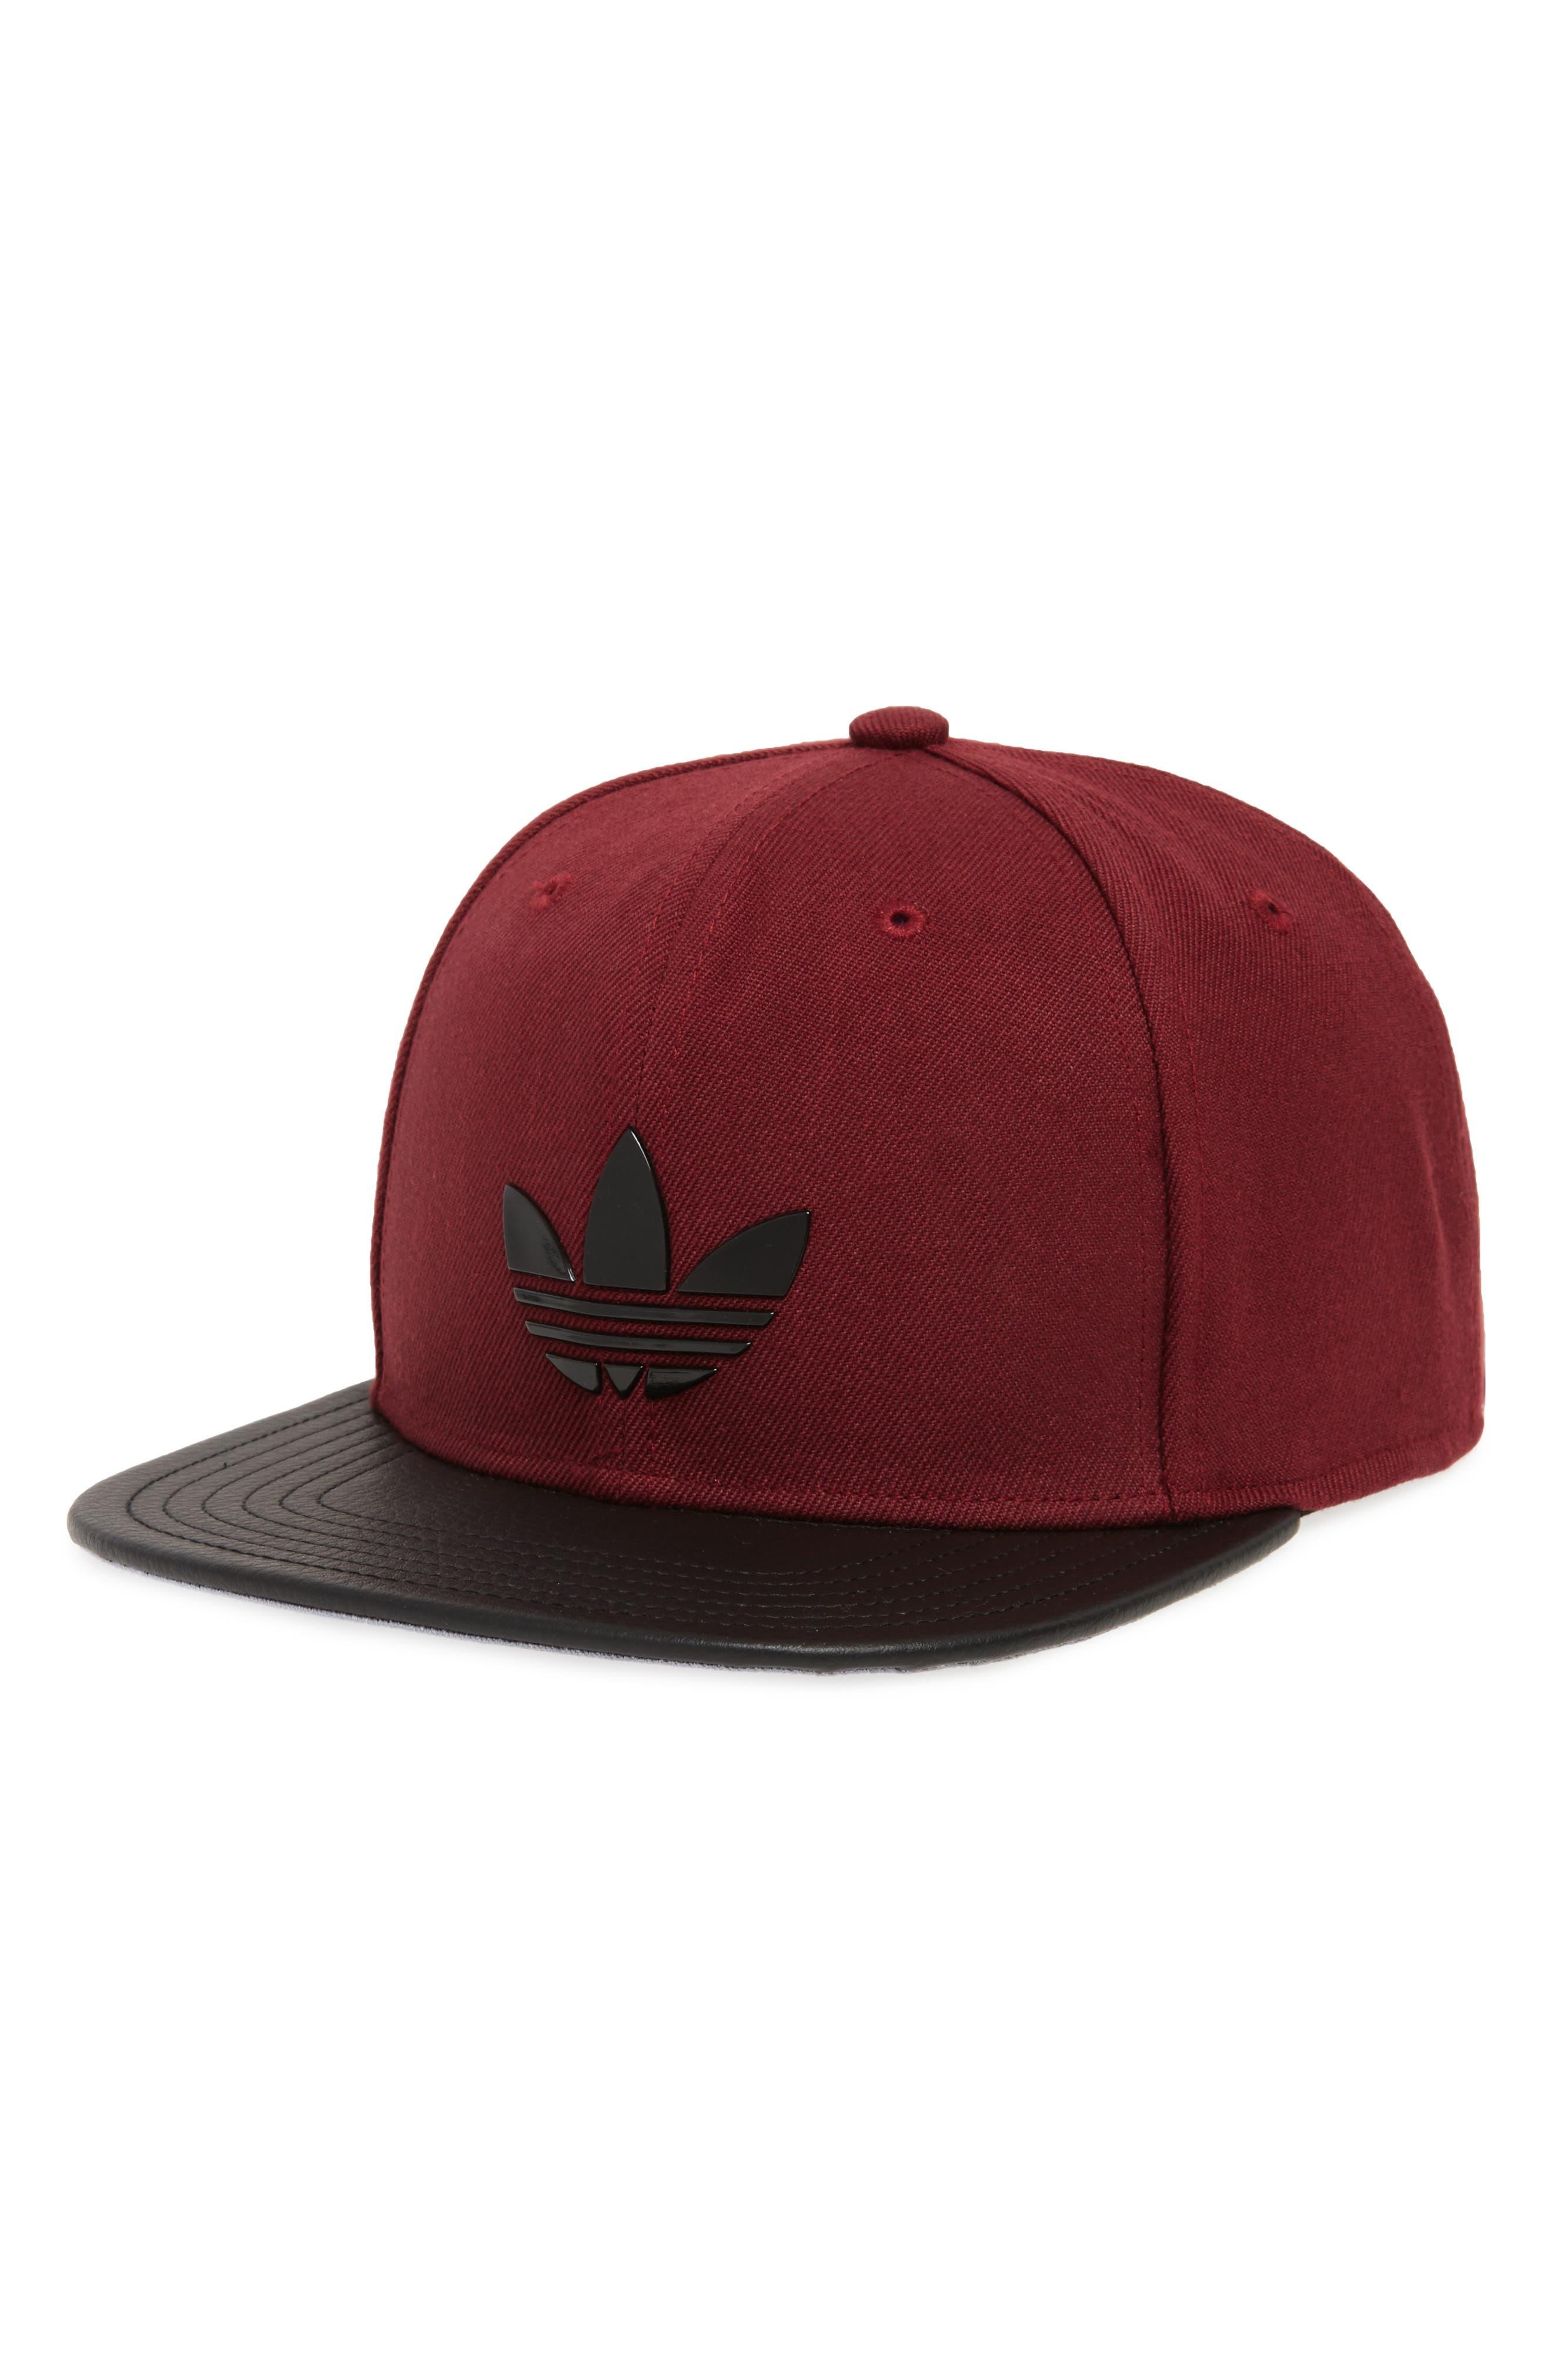 Ori Trefoil Plus Snapback Baseball Cap,                             Main thumbnail 1, color,                             Maroon/ Black Pu